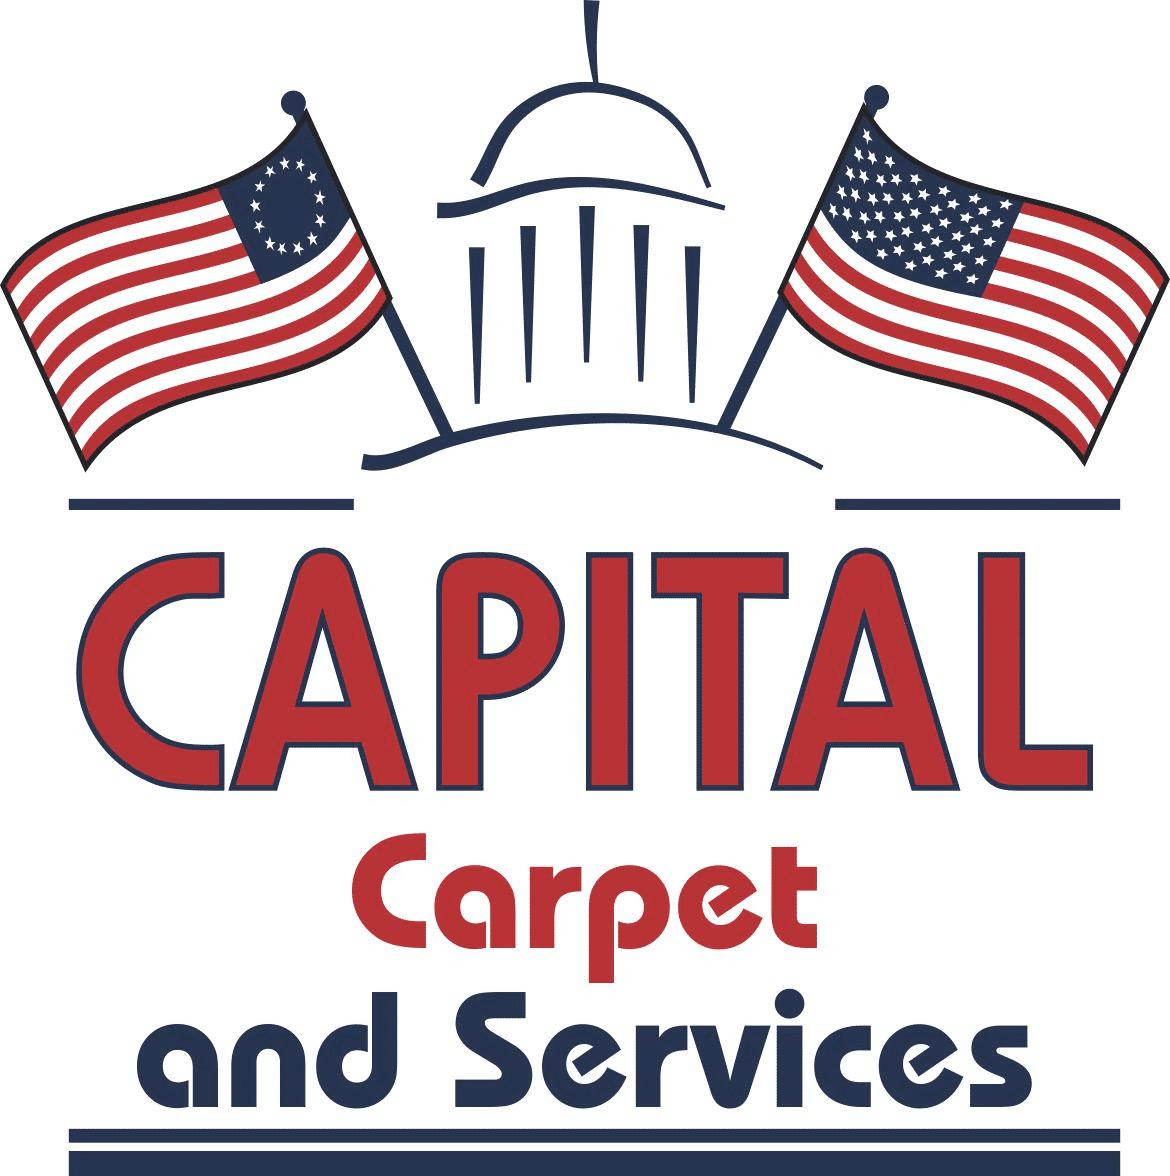 capital carpet and services, carpet cleaning services in hampton, newport news, williamburg, yorktown, hampton roads area